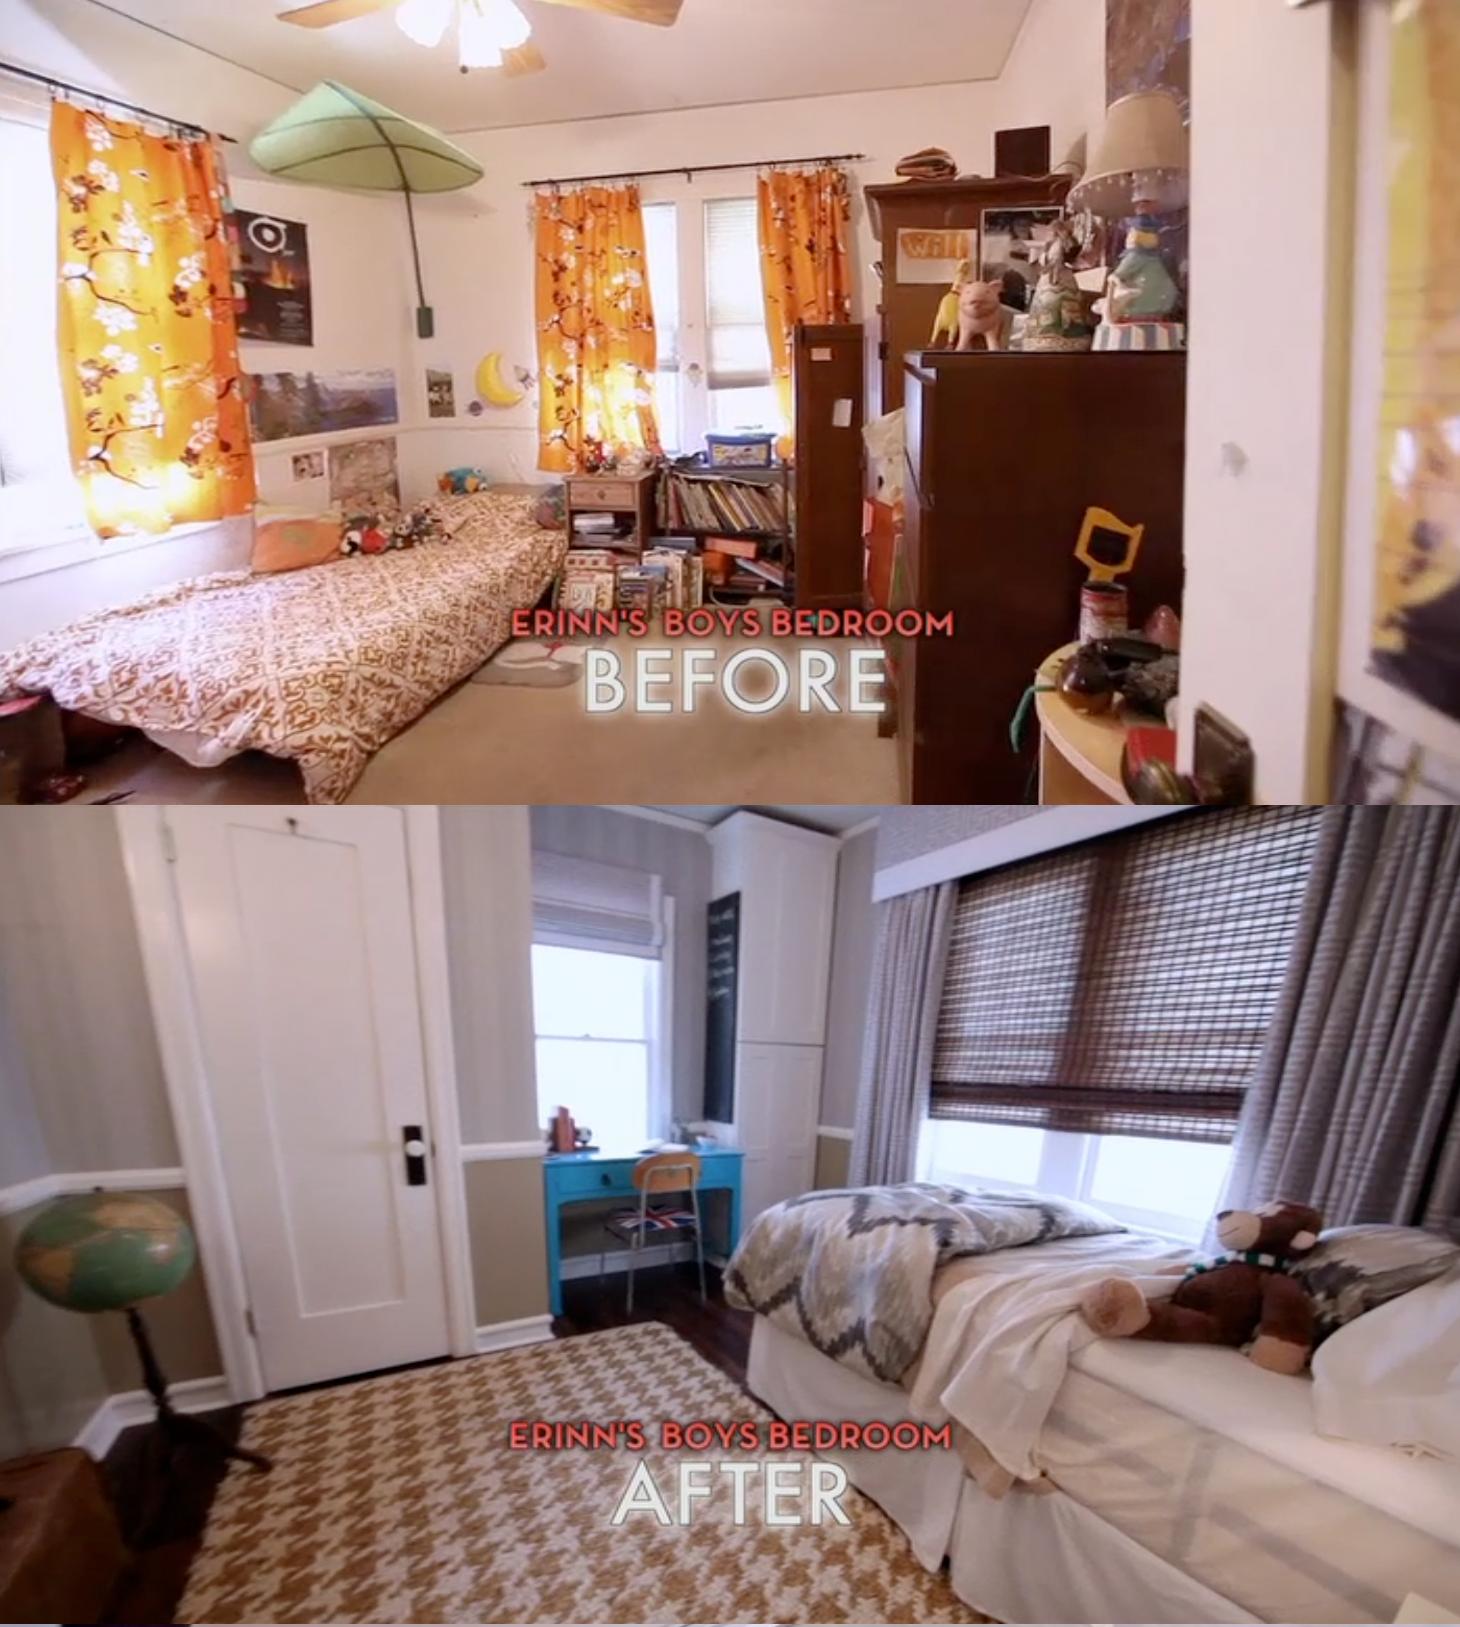 #Dreambuilders Designer Erinn's Re-designed #bedroom